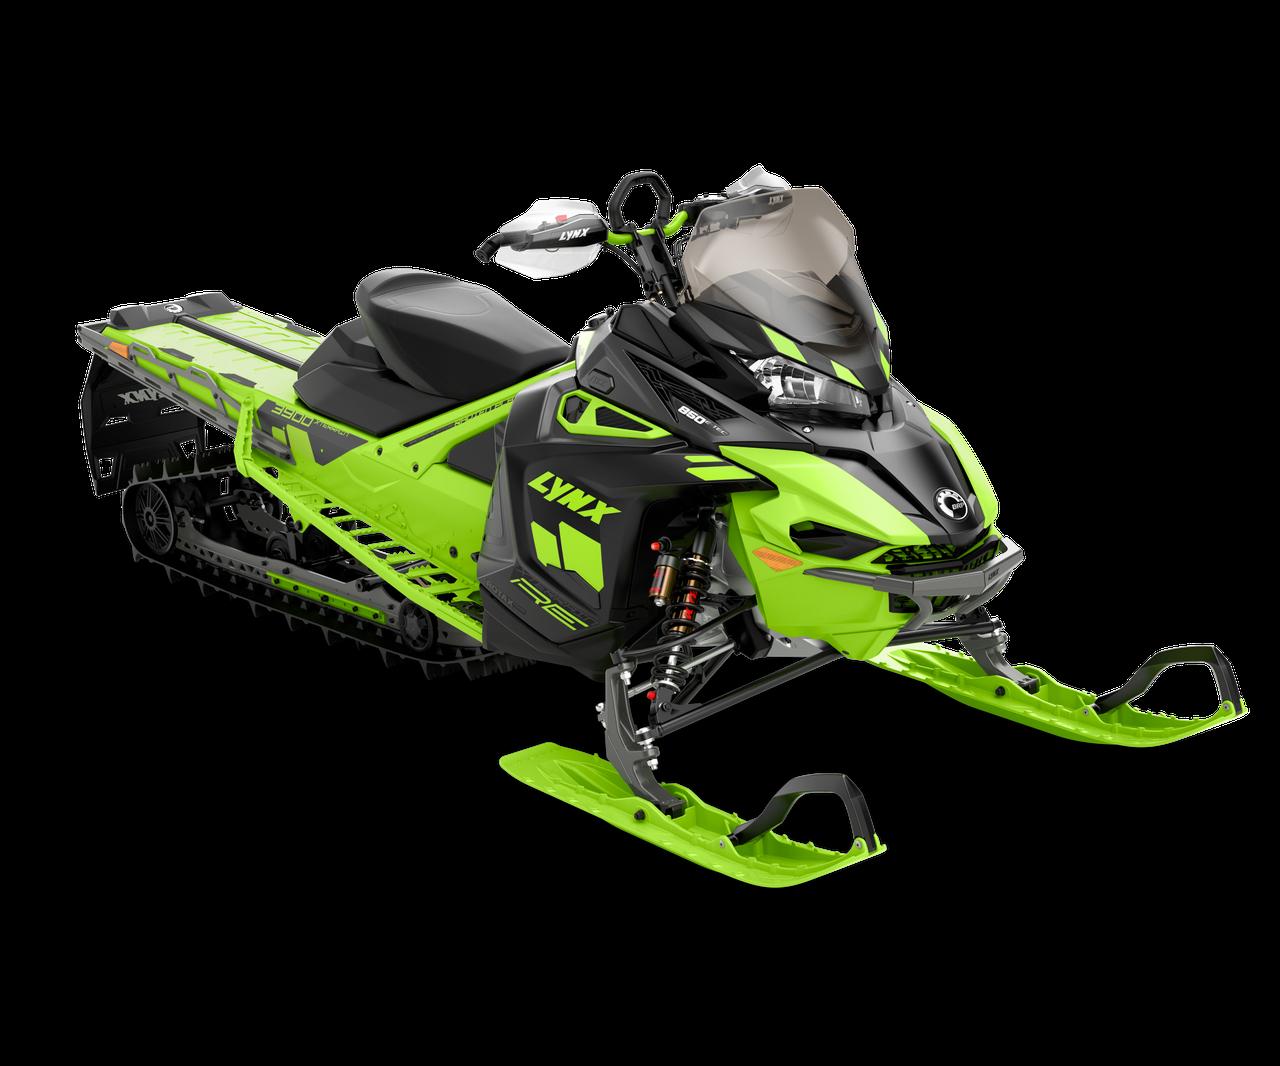 Снегоход XTerrain RE 3900 64mm 850 E-TEC Черно-зеленый 2021